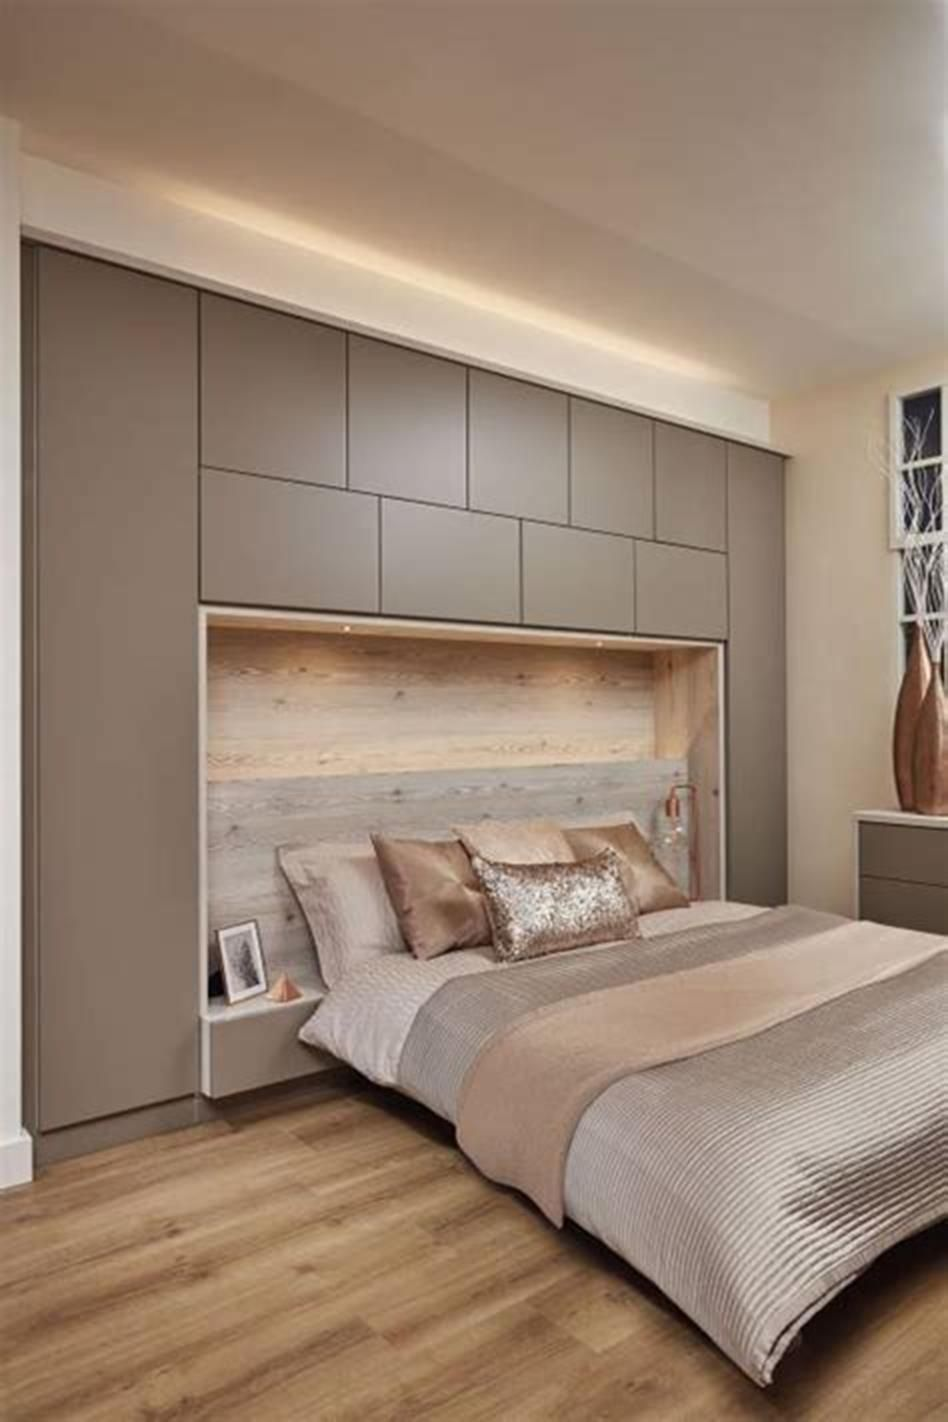 40 cozy minimalist bedroom decorating ideas in 2019 57 on cozy minimalist bedroom decorating ideas id=62987